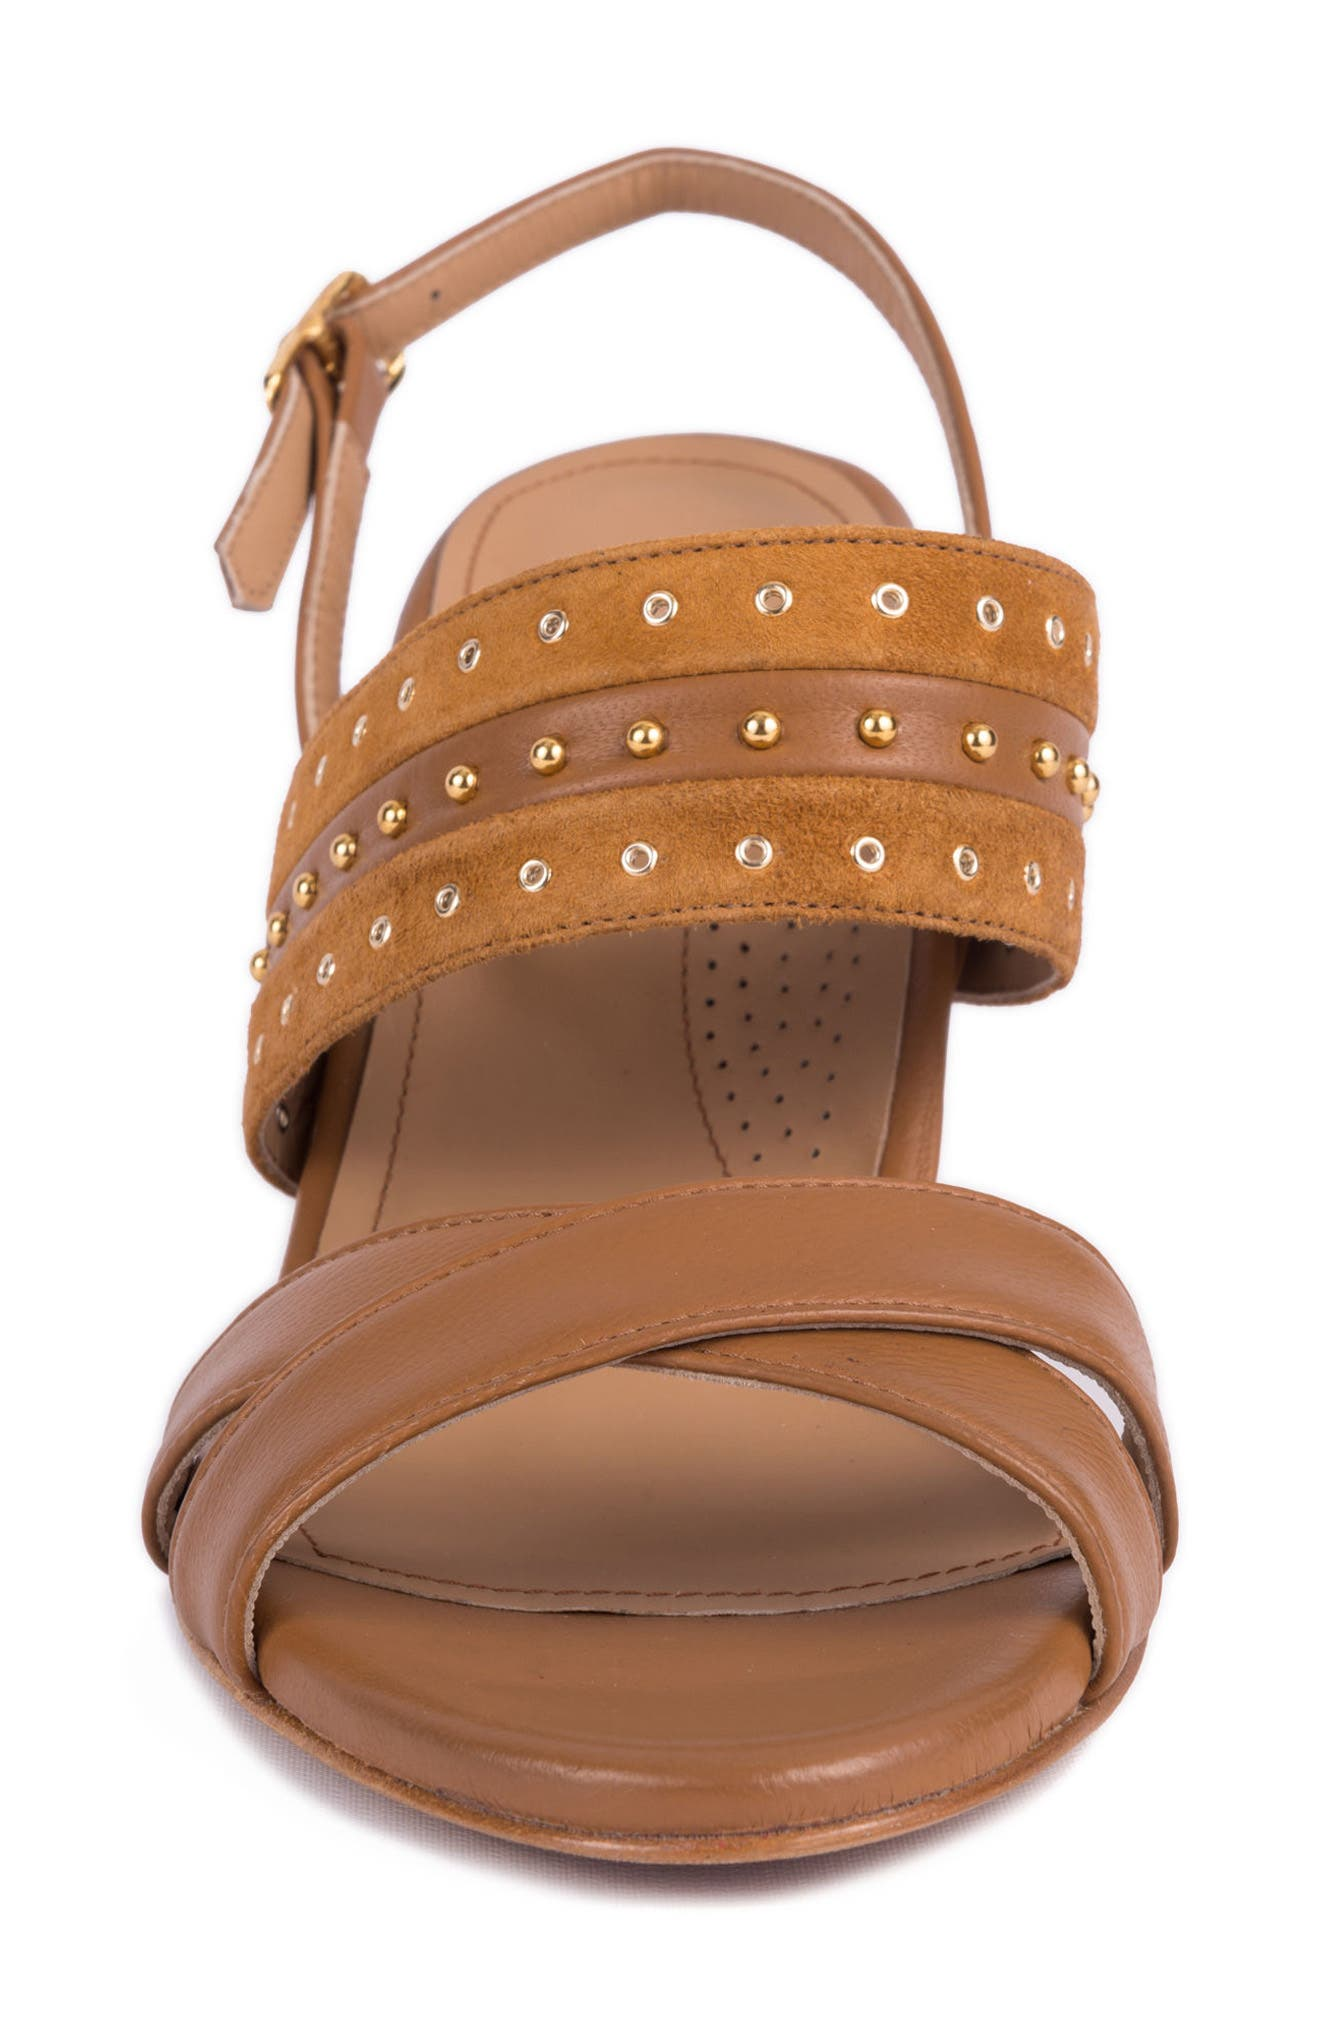 Soldani Studded Slingback Sandal,                             Alternate thumbnail 4, color,                             250